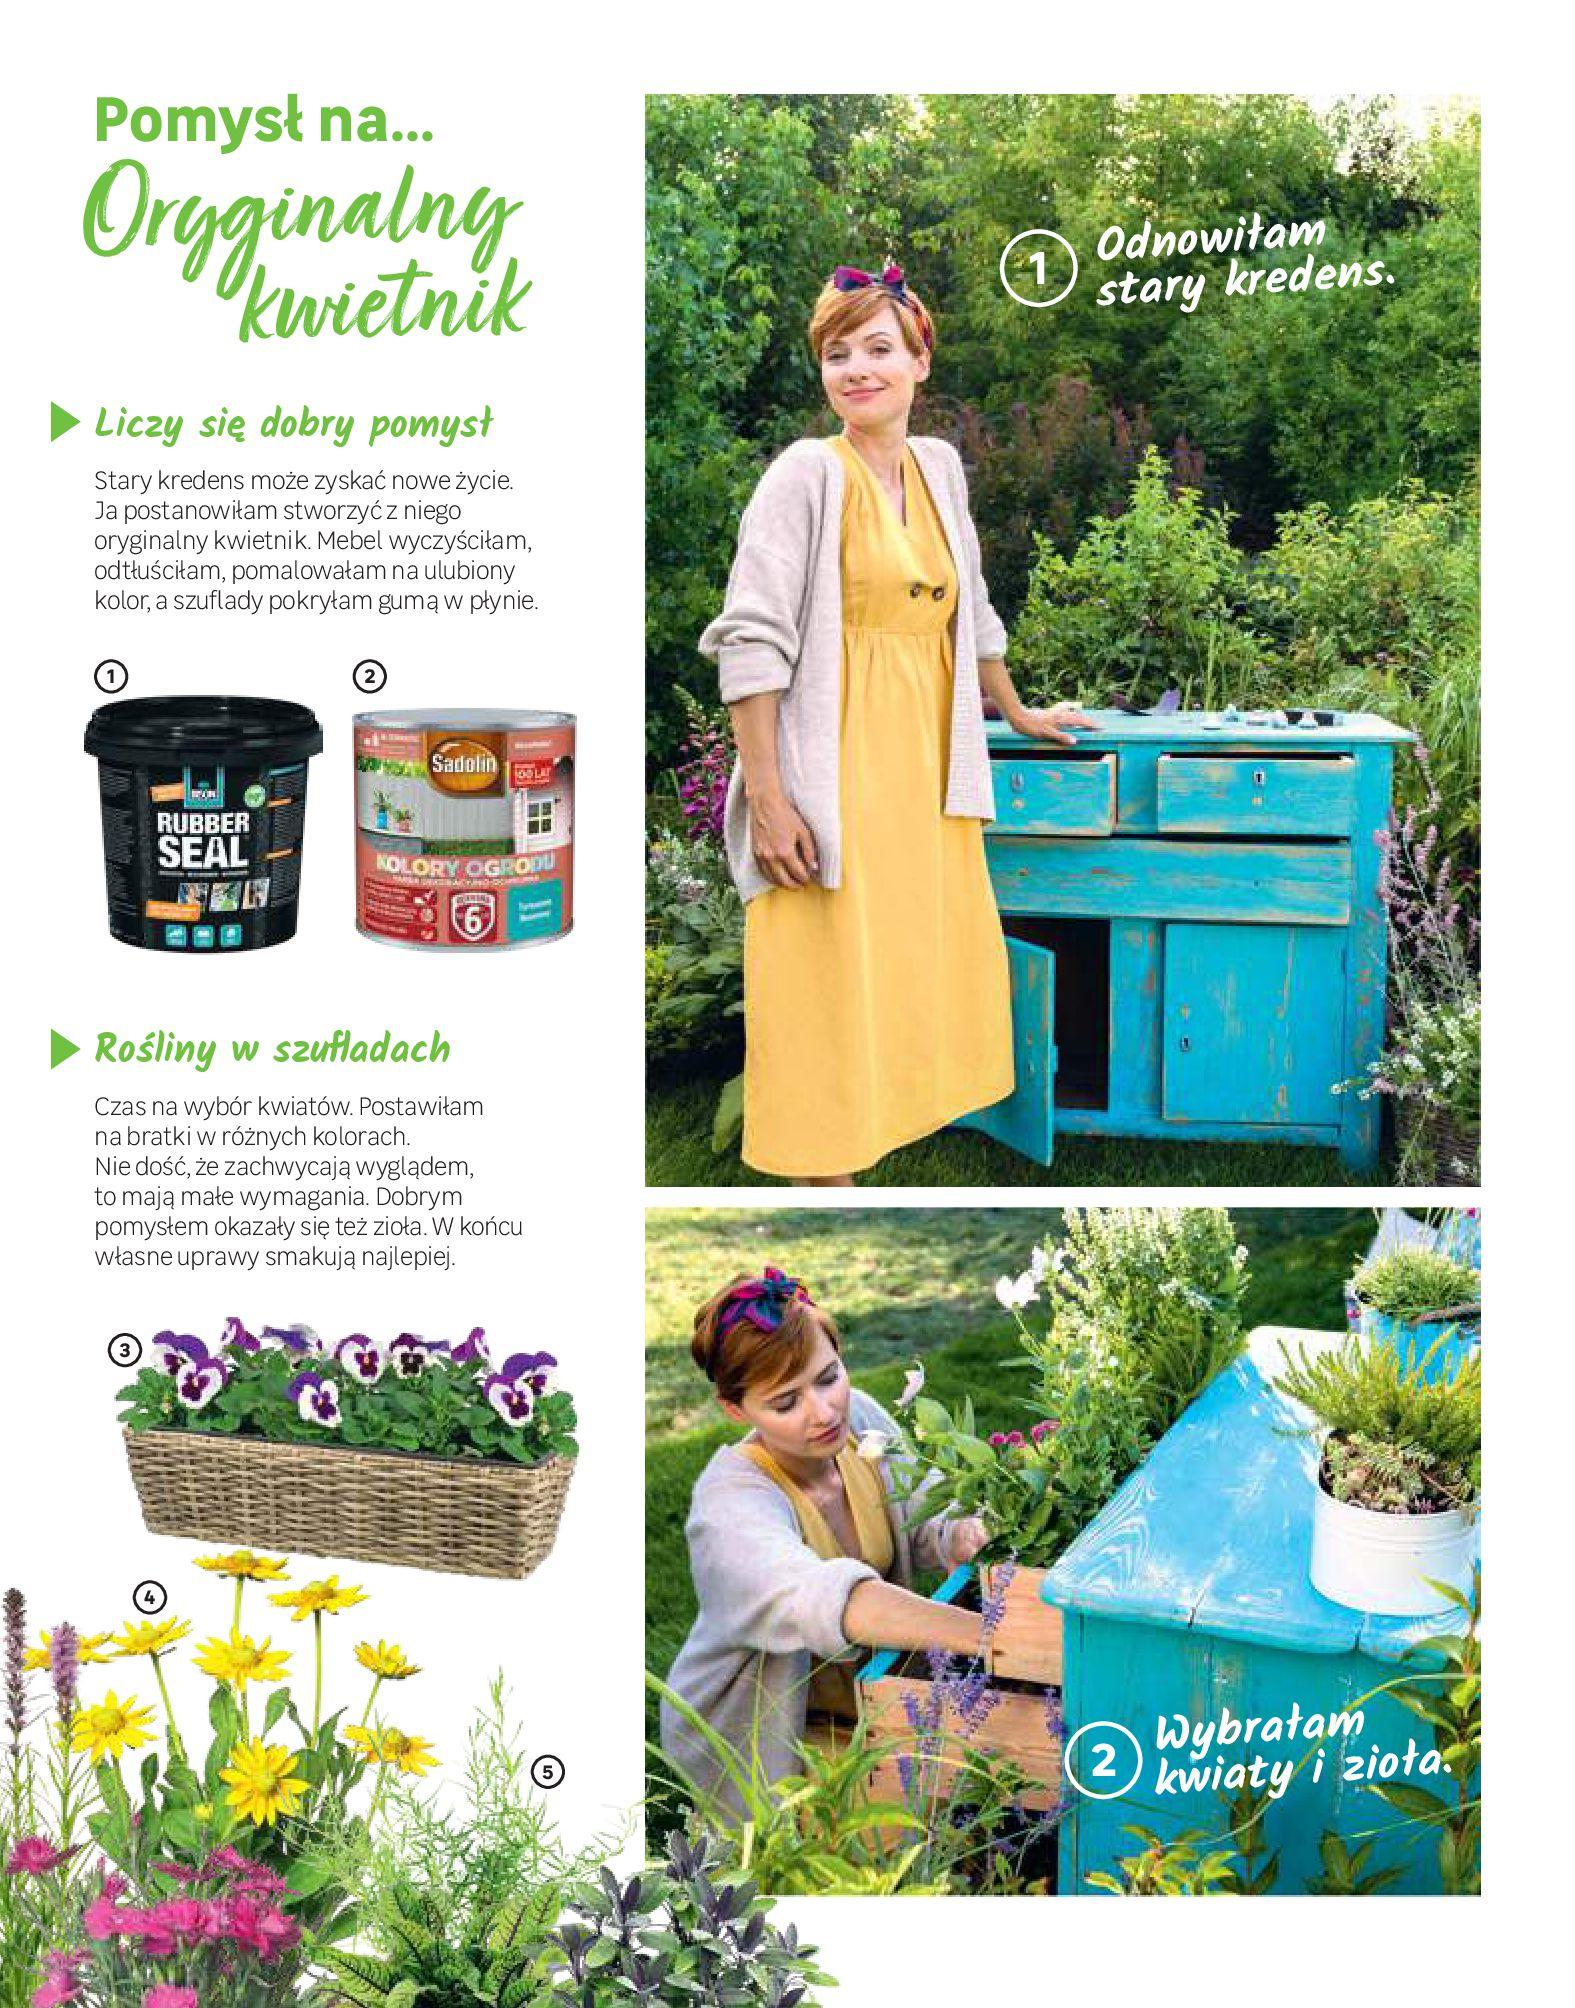 Gazetka Leroy Merlin: Katalog Ogród 2021-03-10 page-94